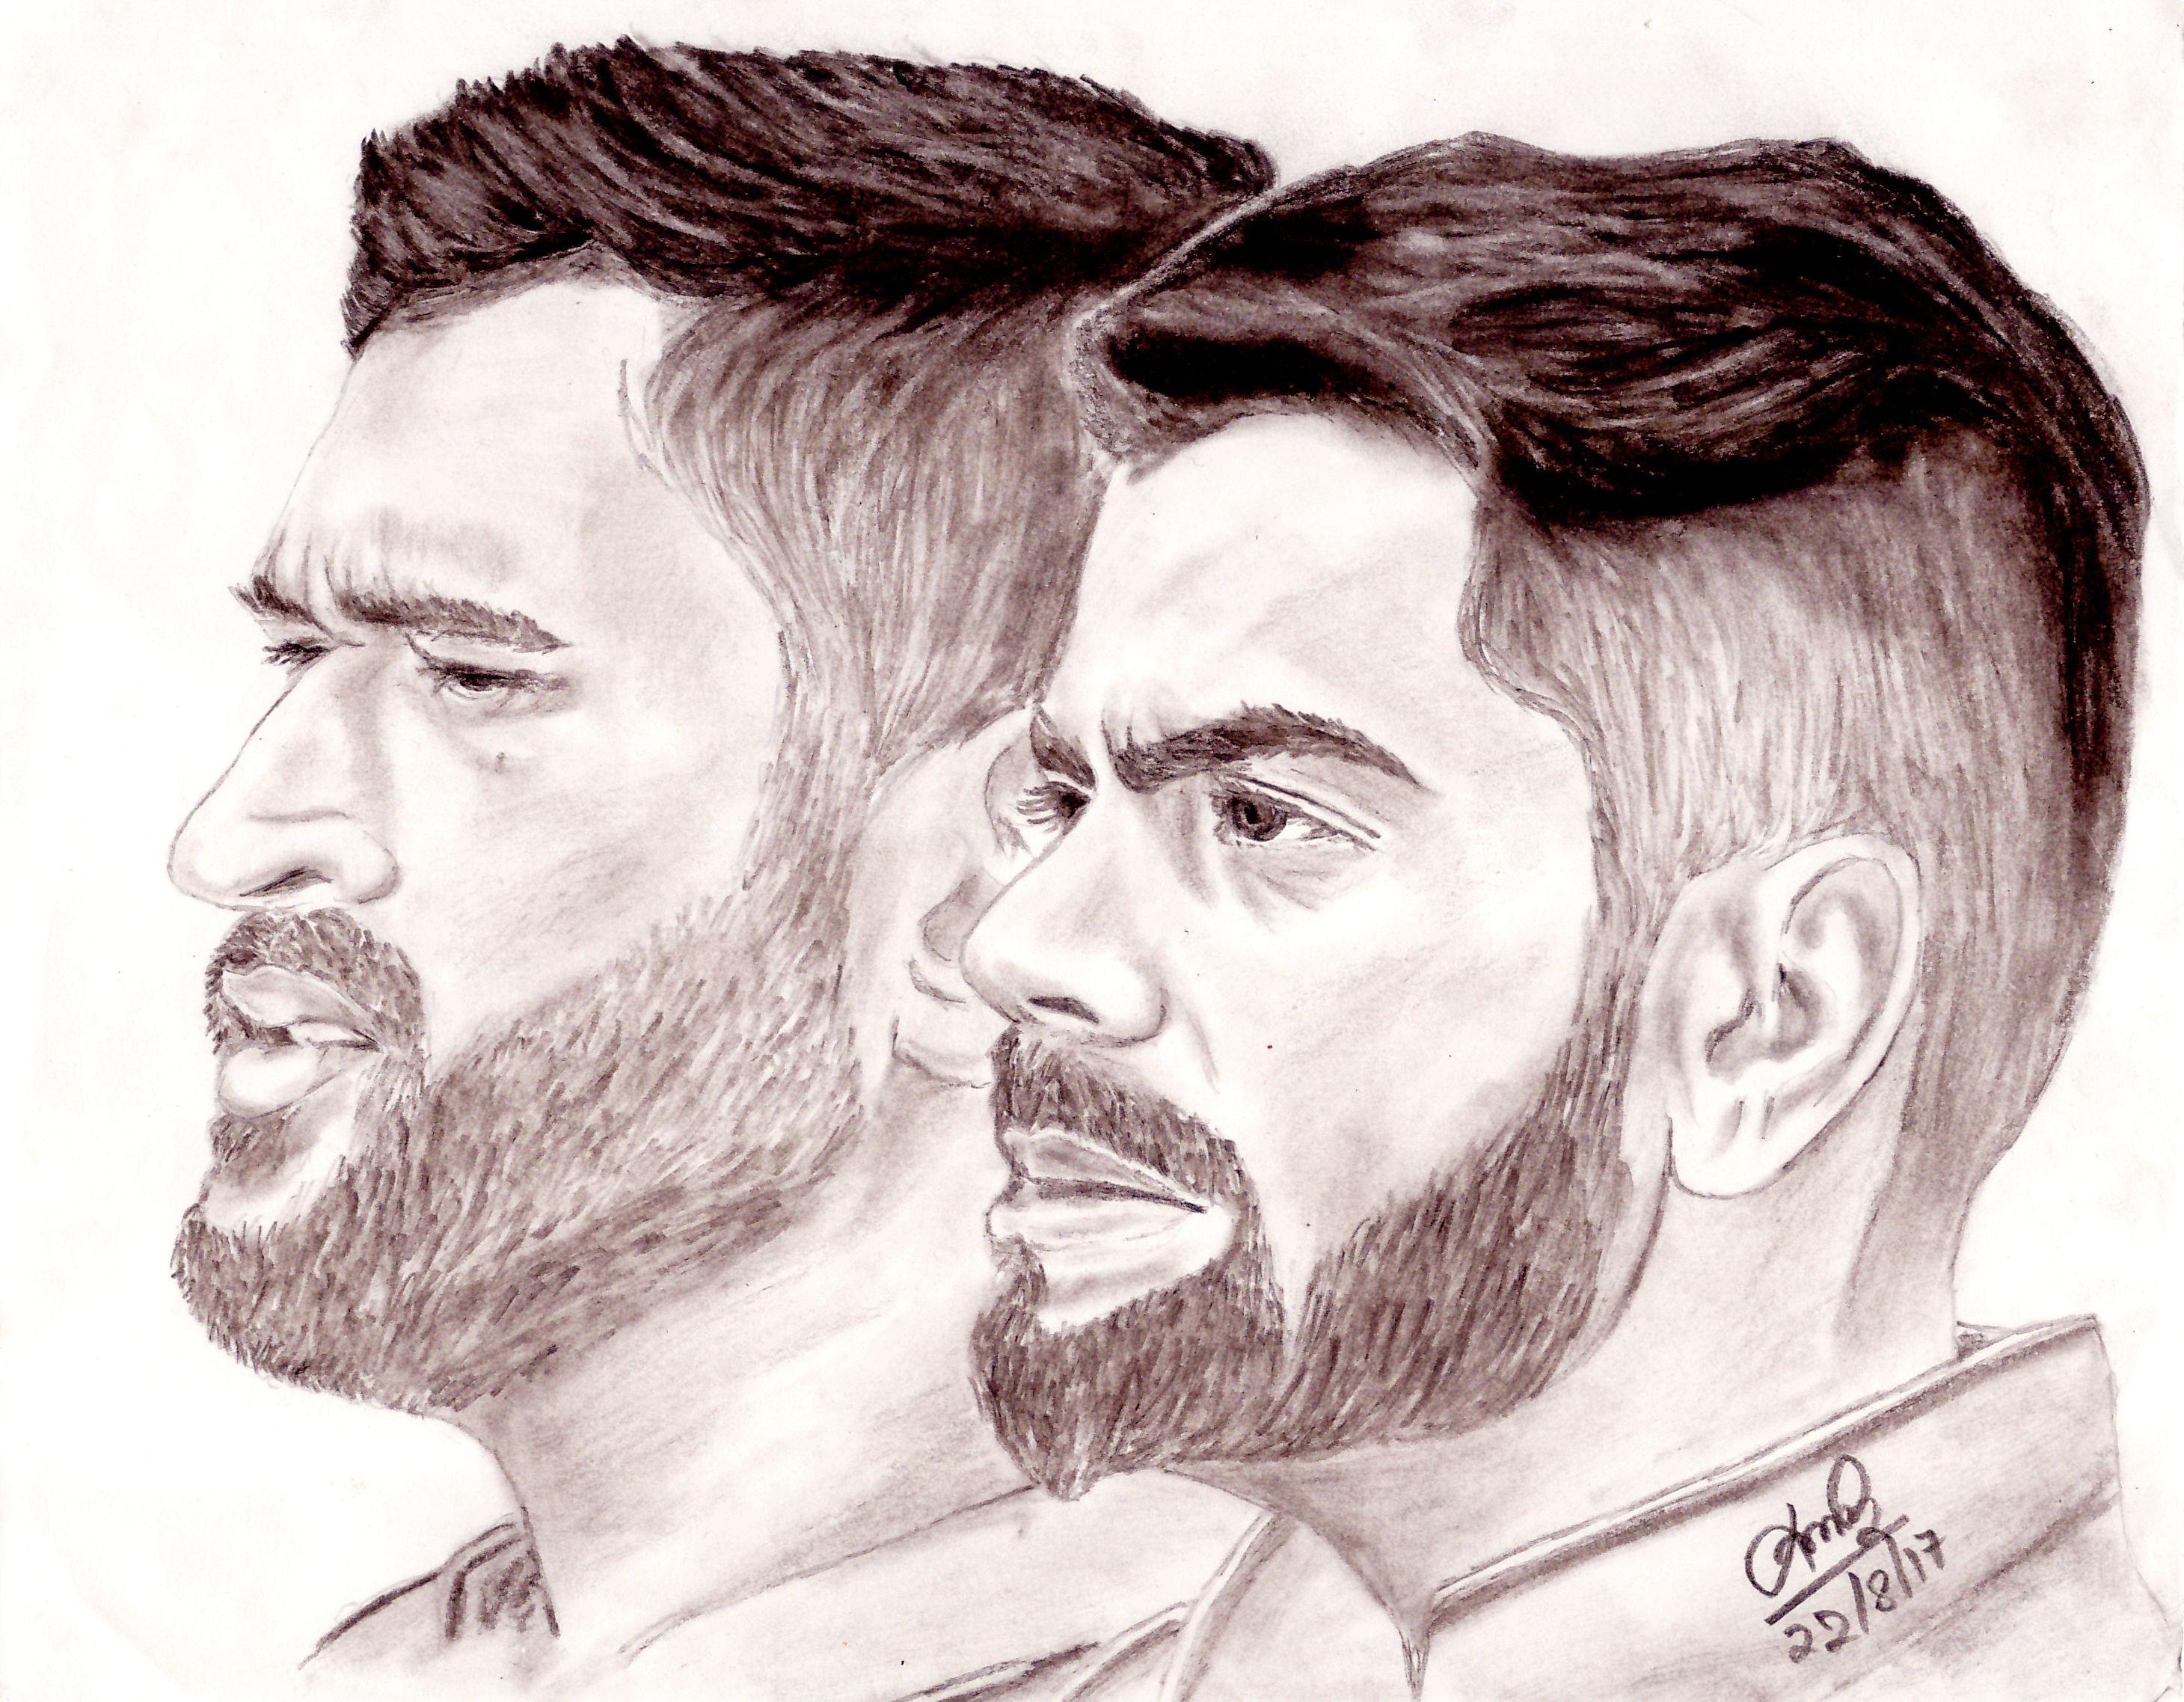 M s dhoni virat kohli sketch msd